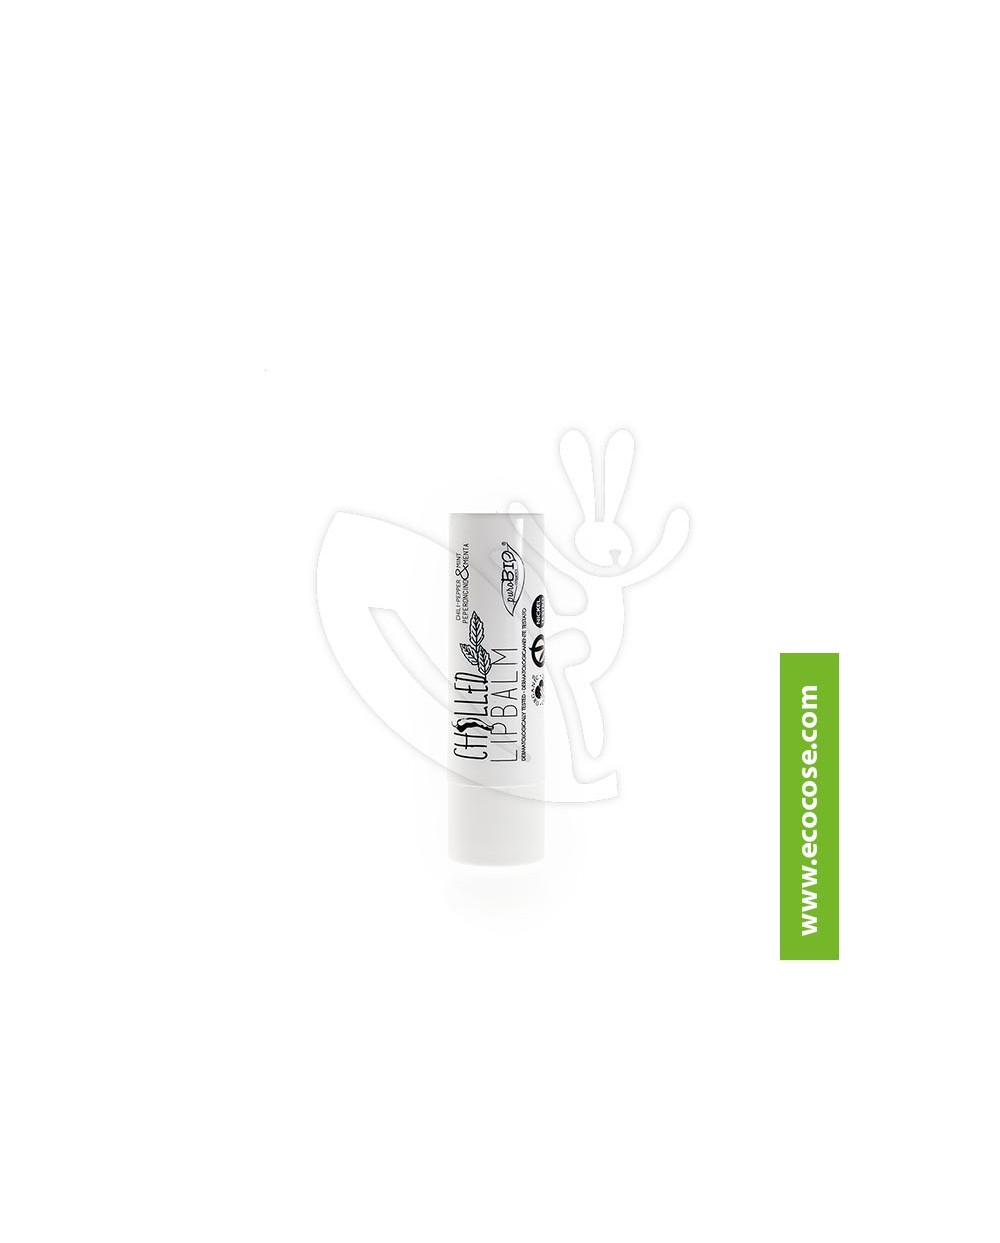 PuroBIO Cosmetics - Lipbalm Chilled *NEW*